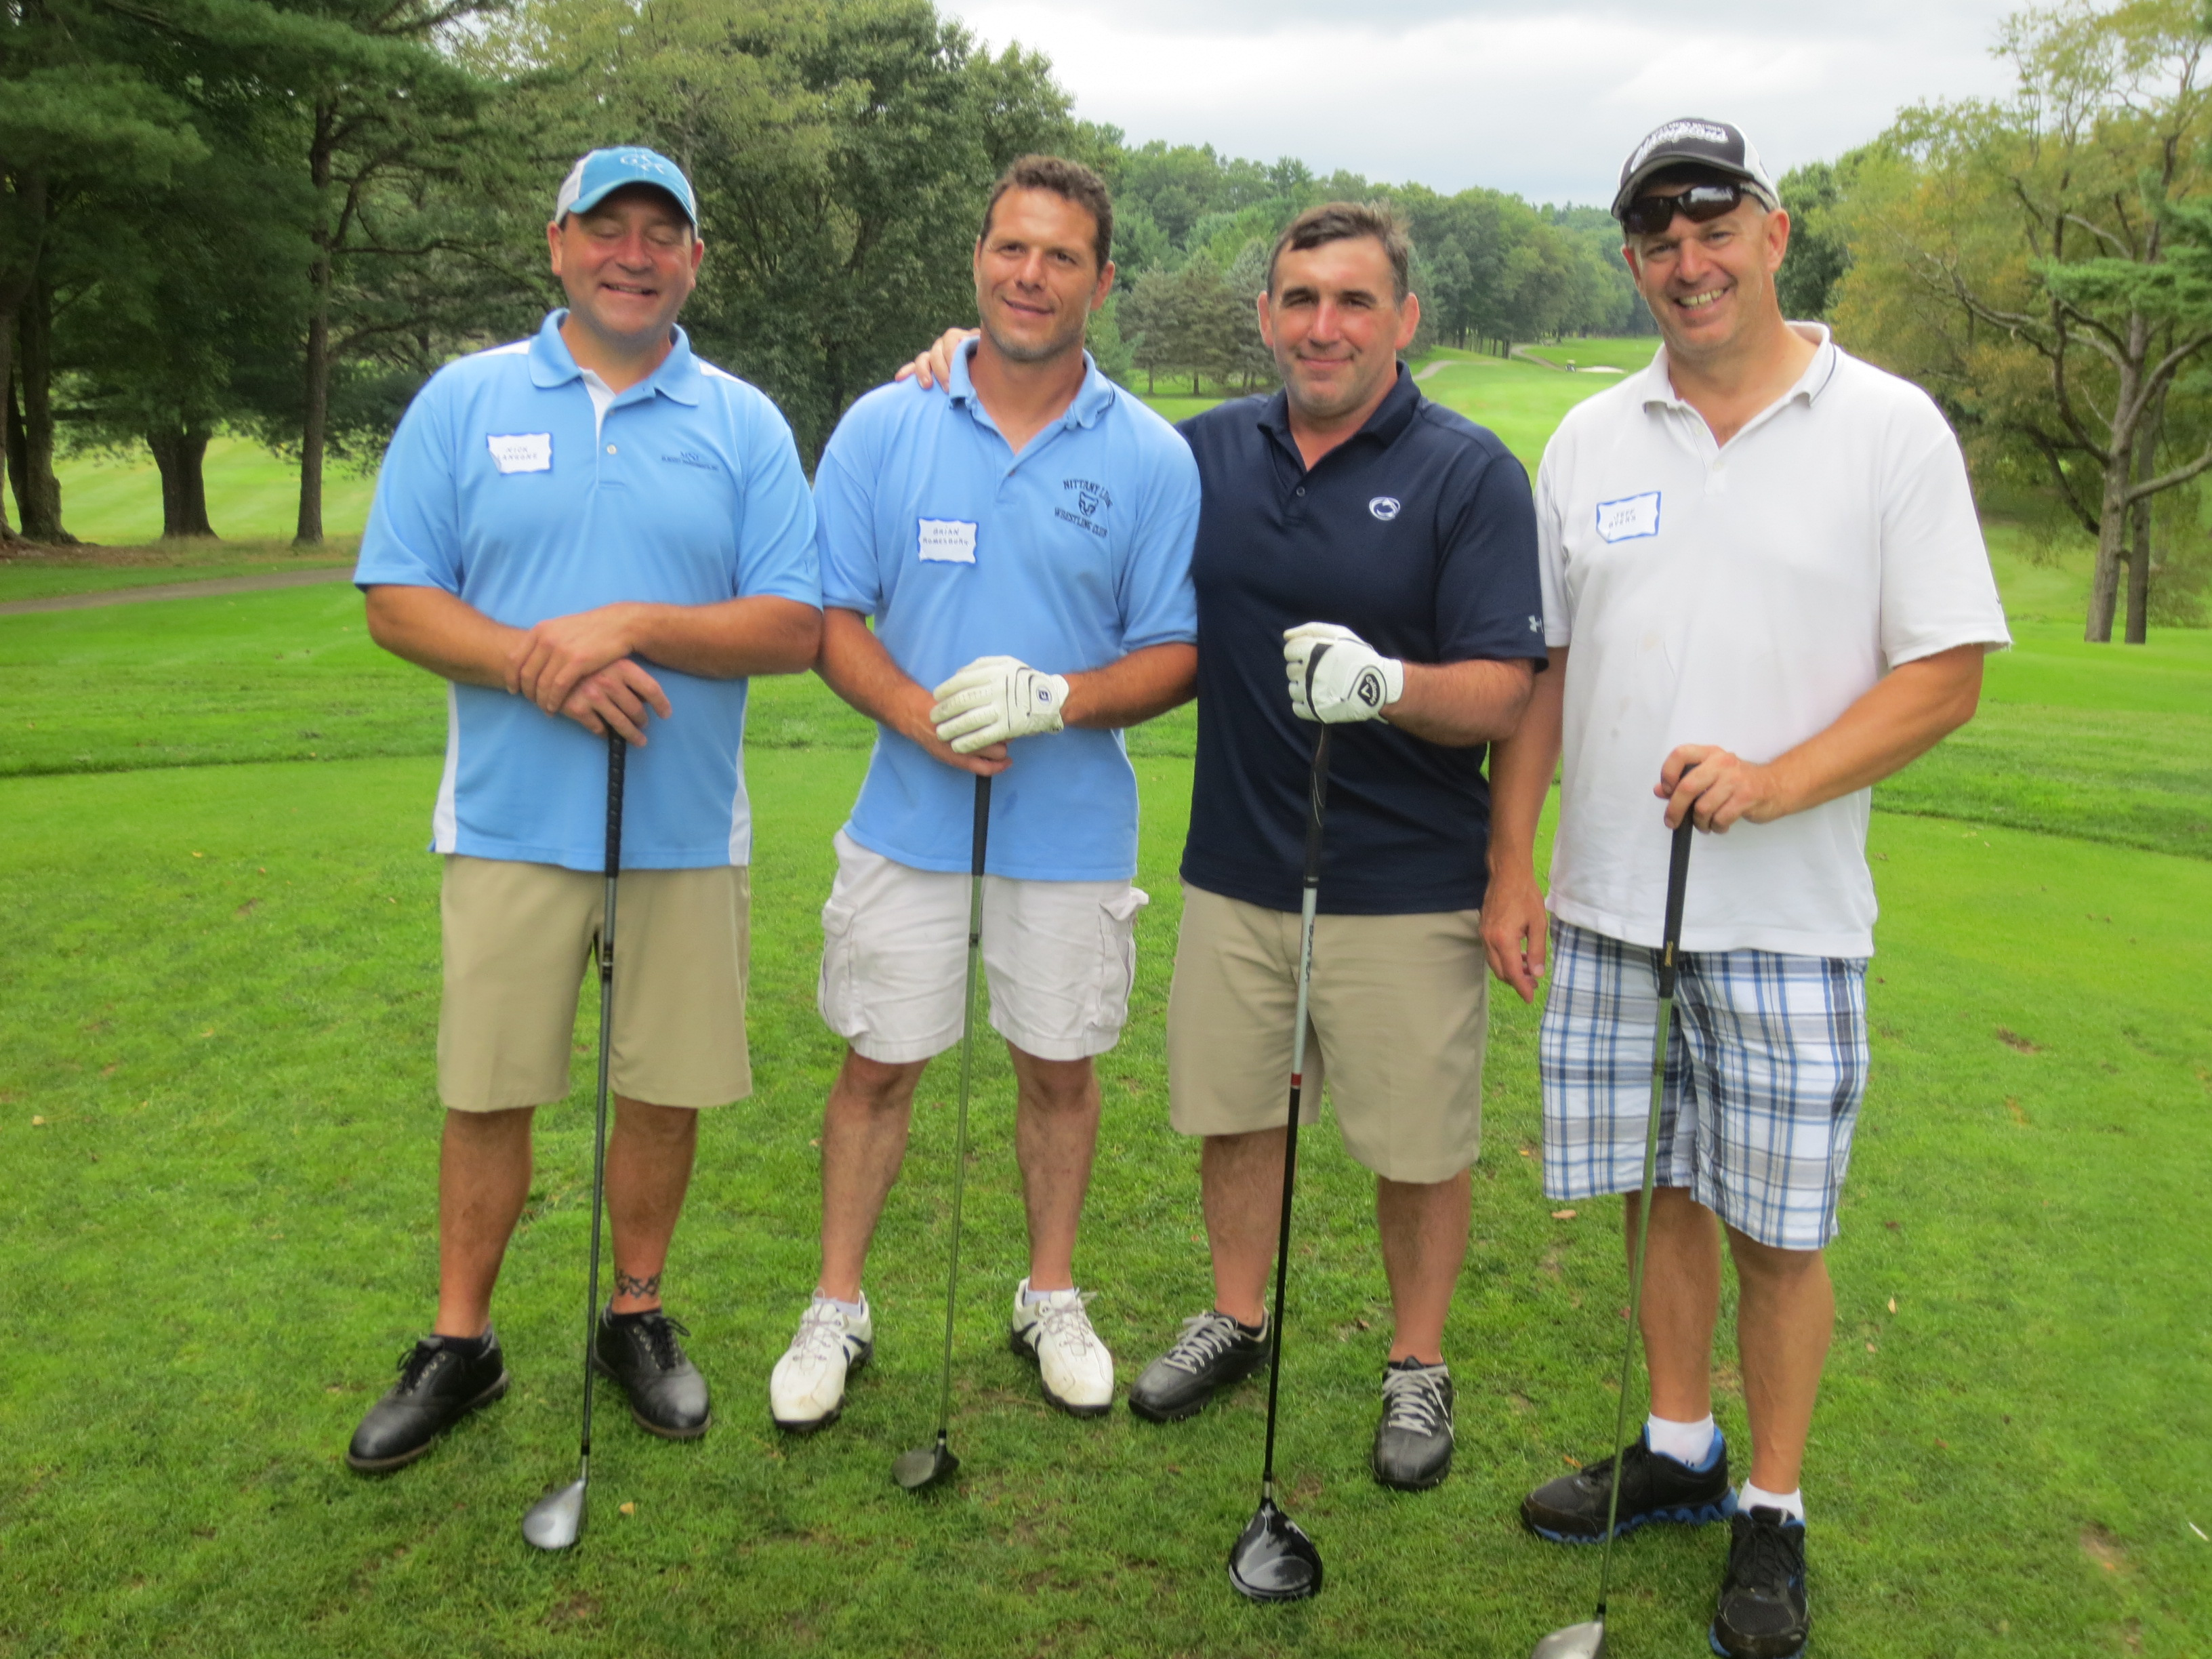 Nick Langone, Brian Romesburg, Glenn Pritzlaff, Jeff Byers